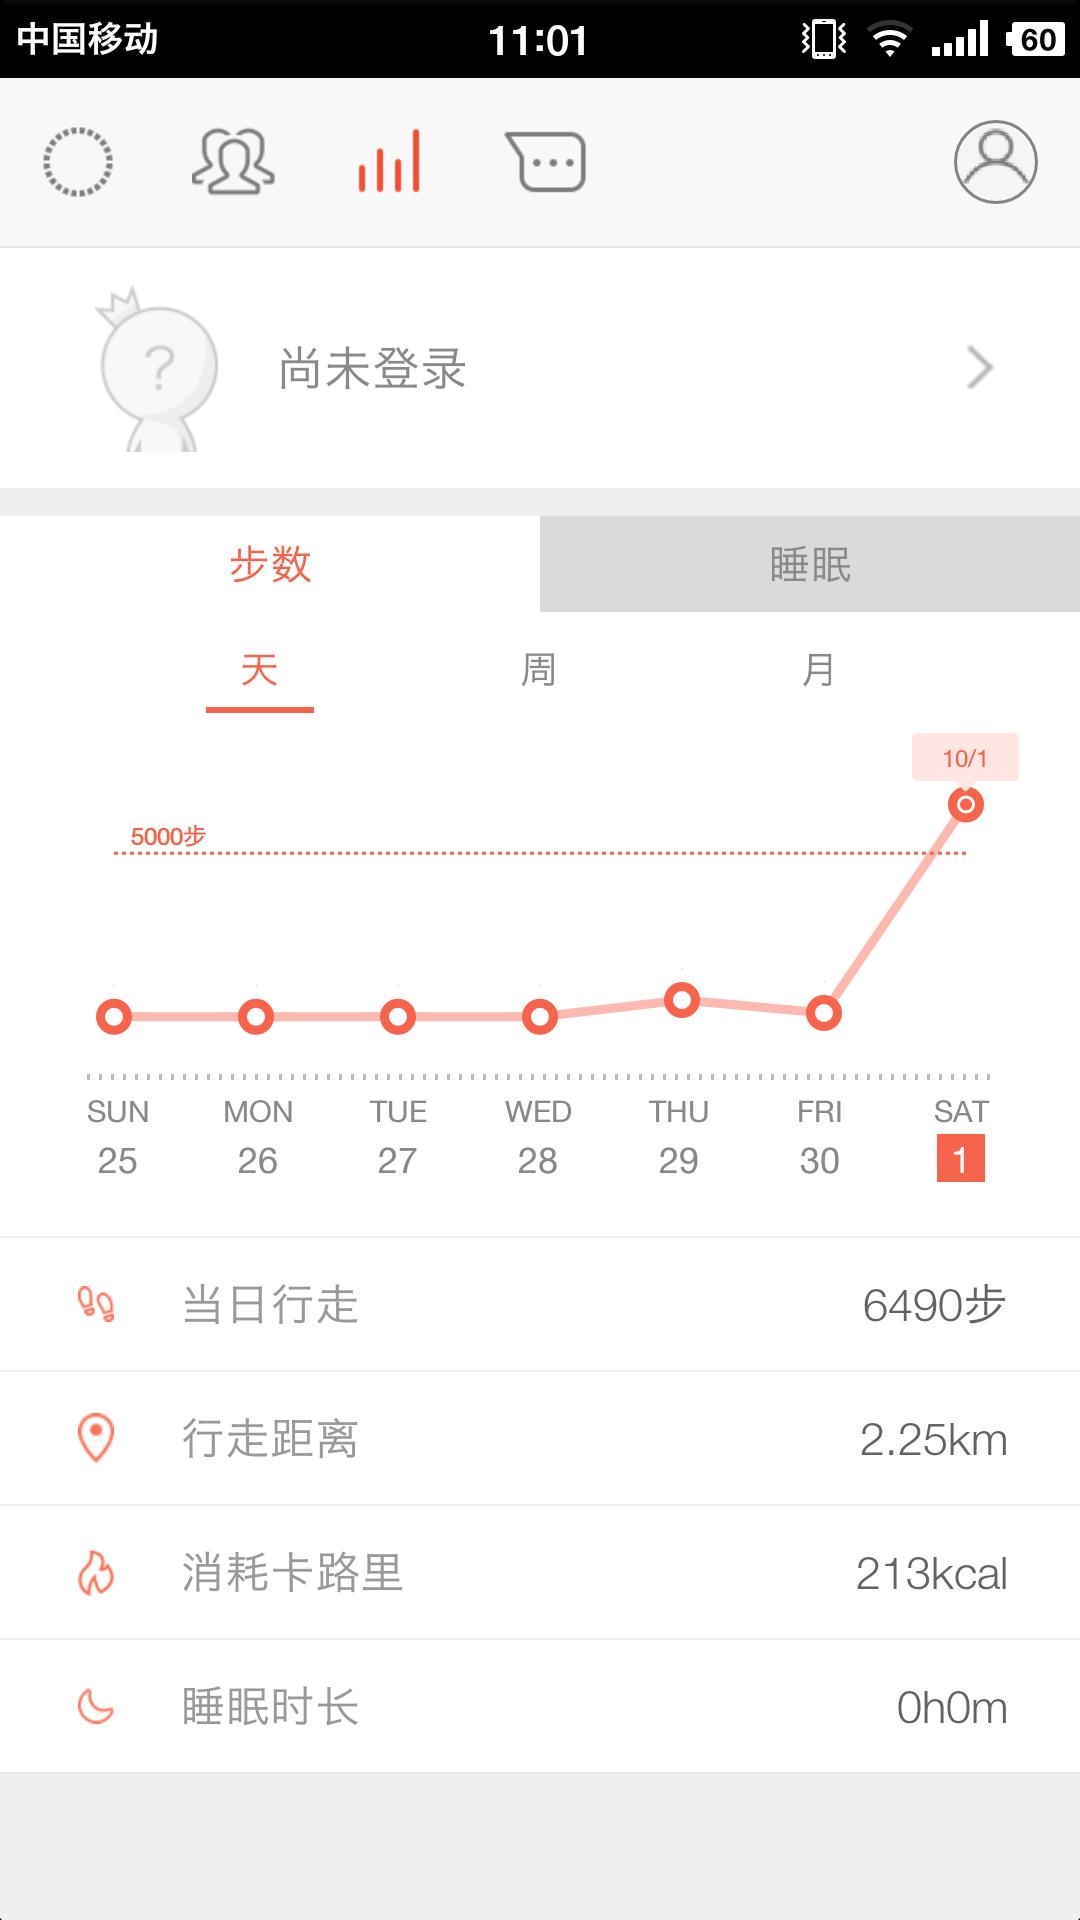 Screenshot_2016-10-09-11-01-43-058_春雨计步器.png